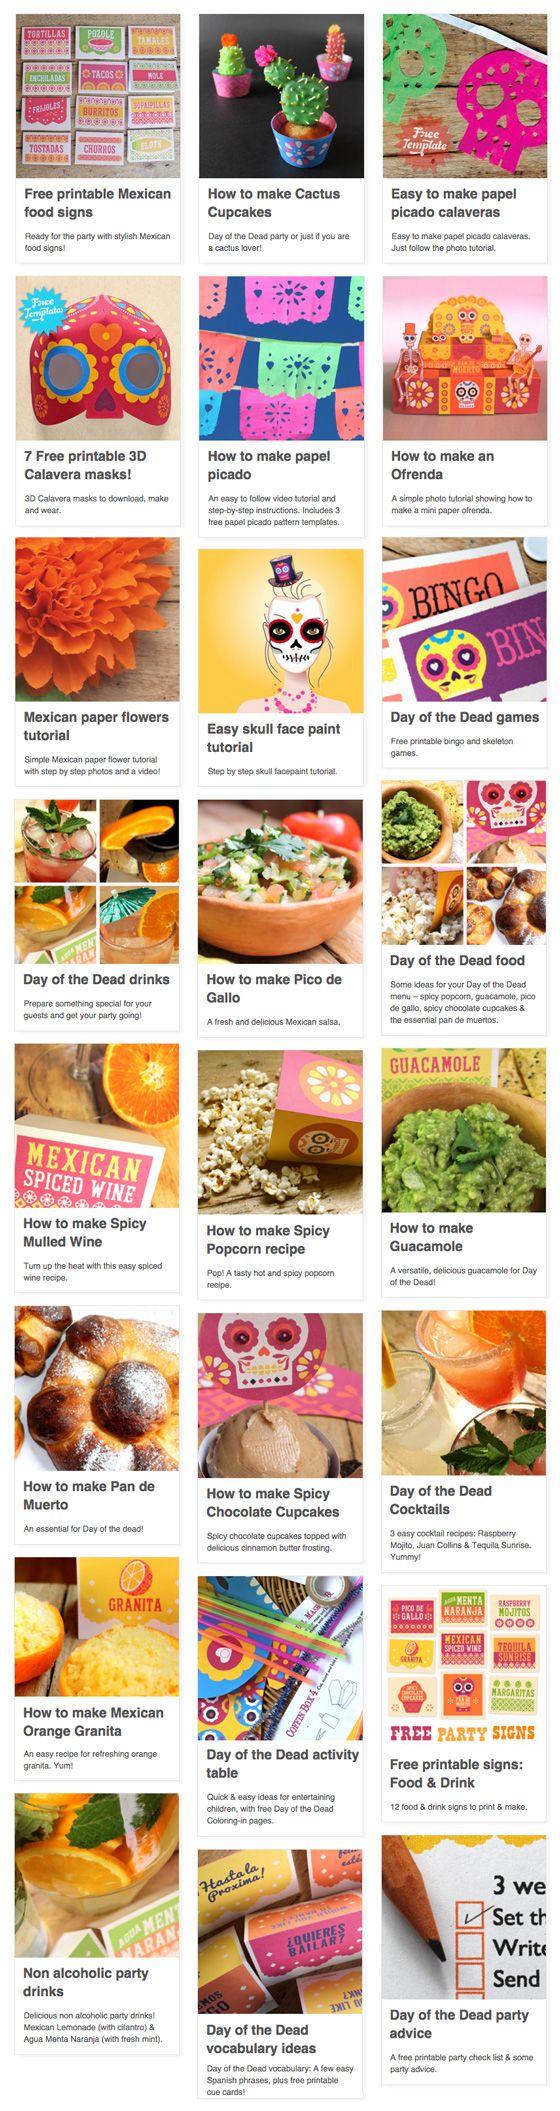 OCTUBRE - 24 party ideas for Day of the Dead or DÍa de los Muertos. https://happythought.co.uk/day-of-the-dead-ideas #dayofthedead #eldiadelosmuertos